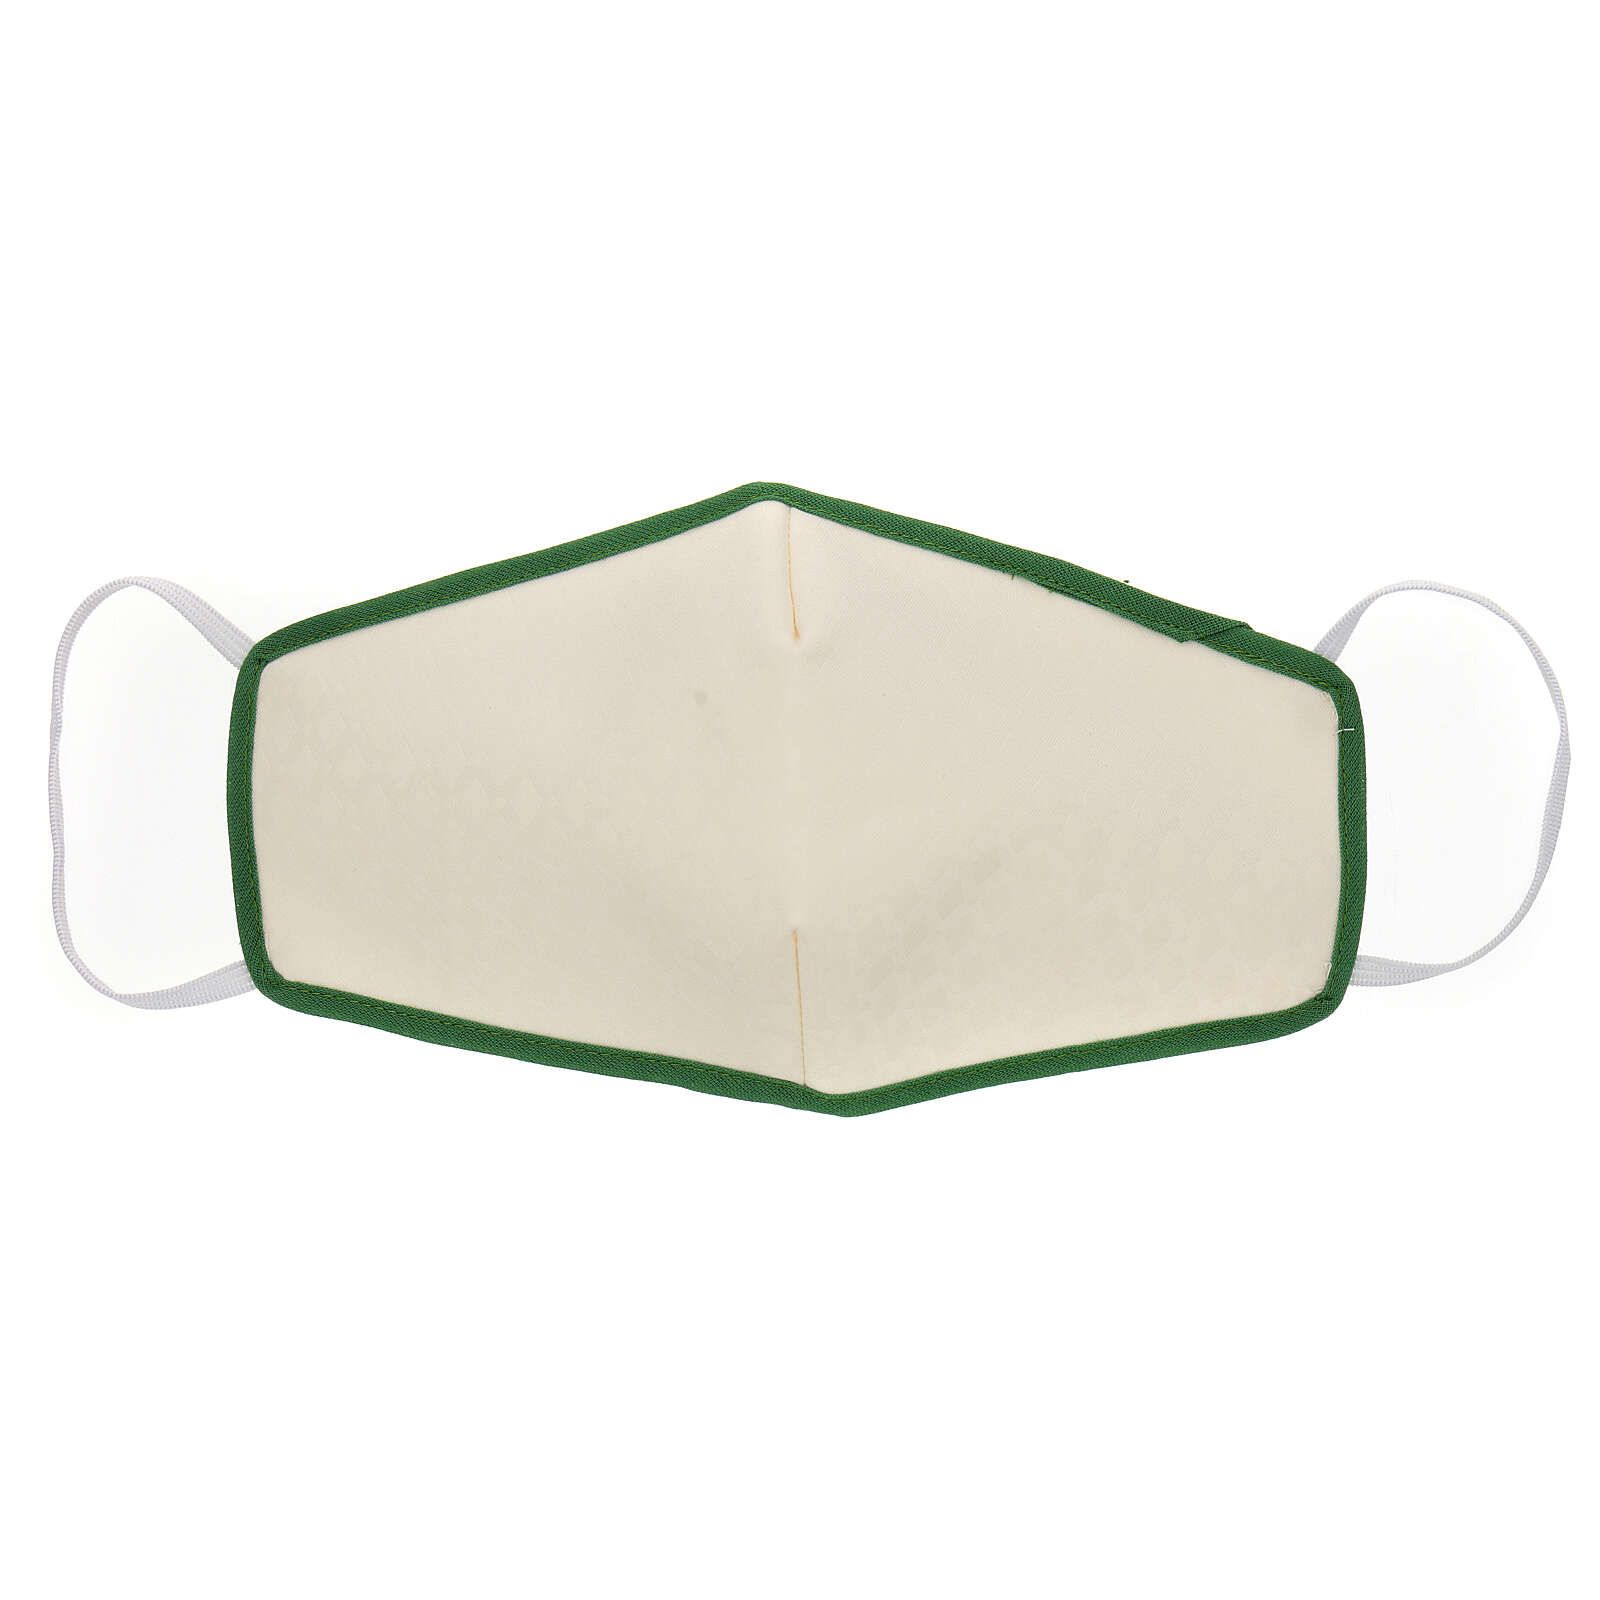 Mascarilla de tela reutilizable borde verde 3